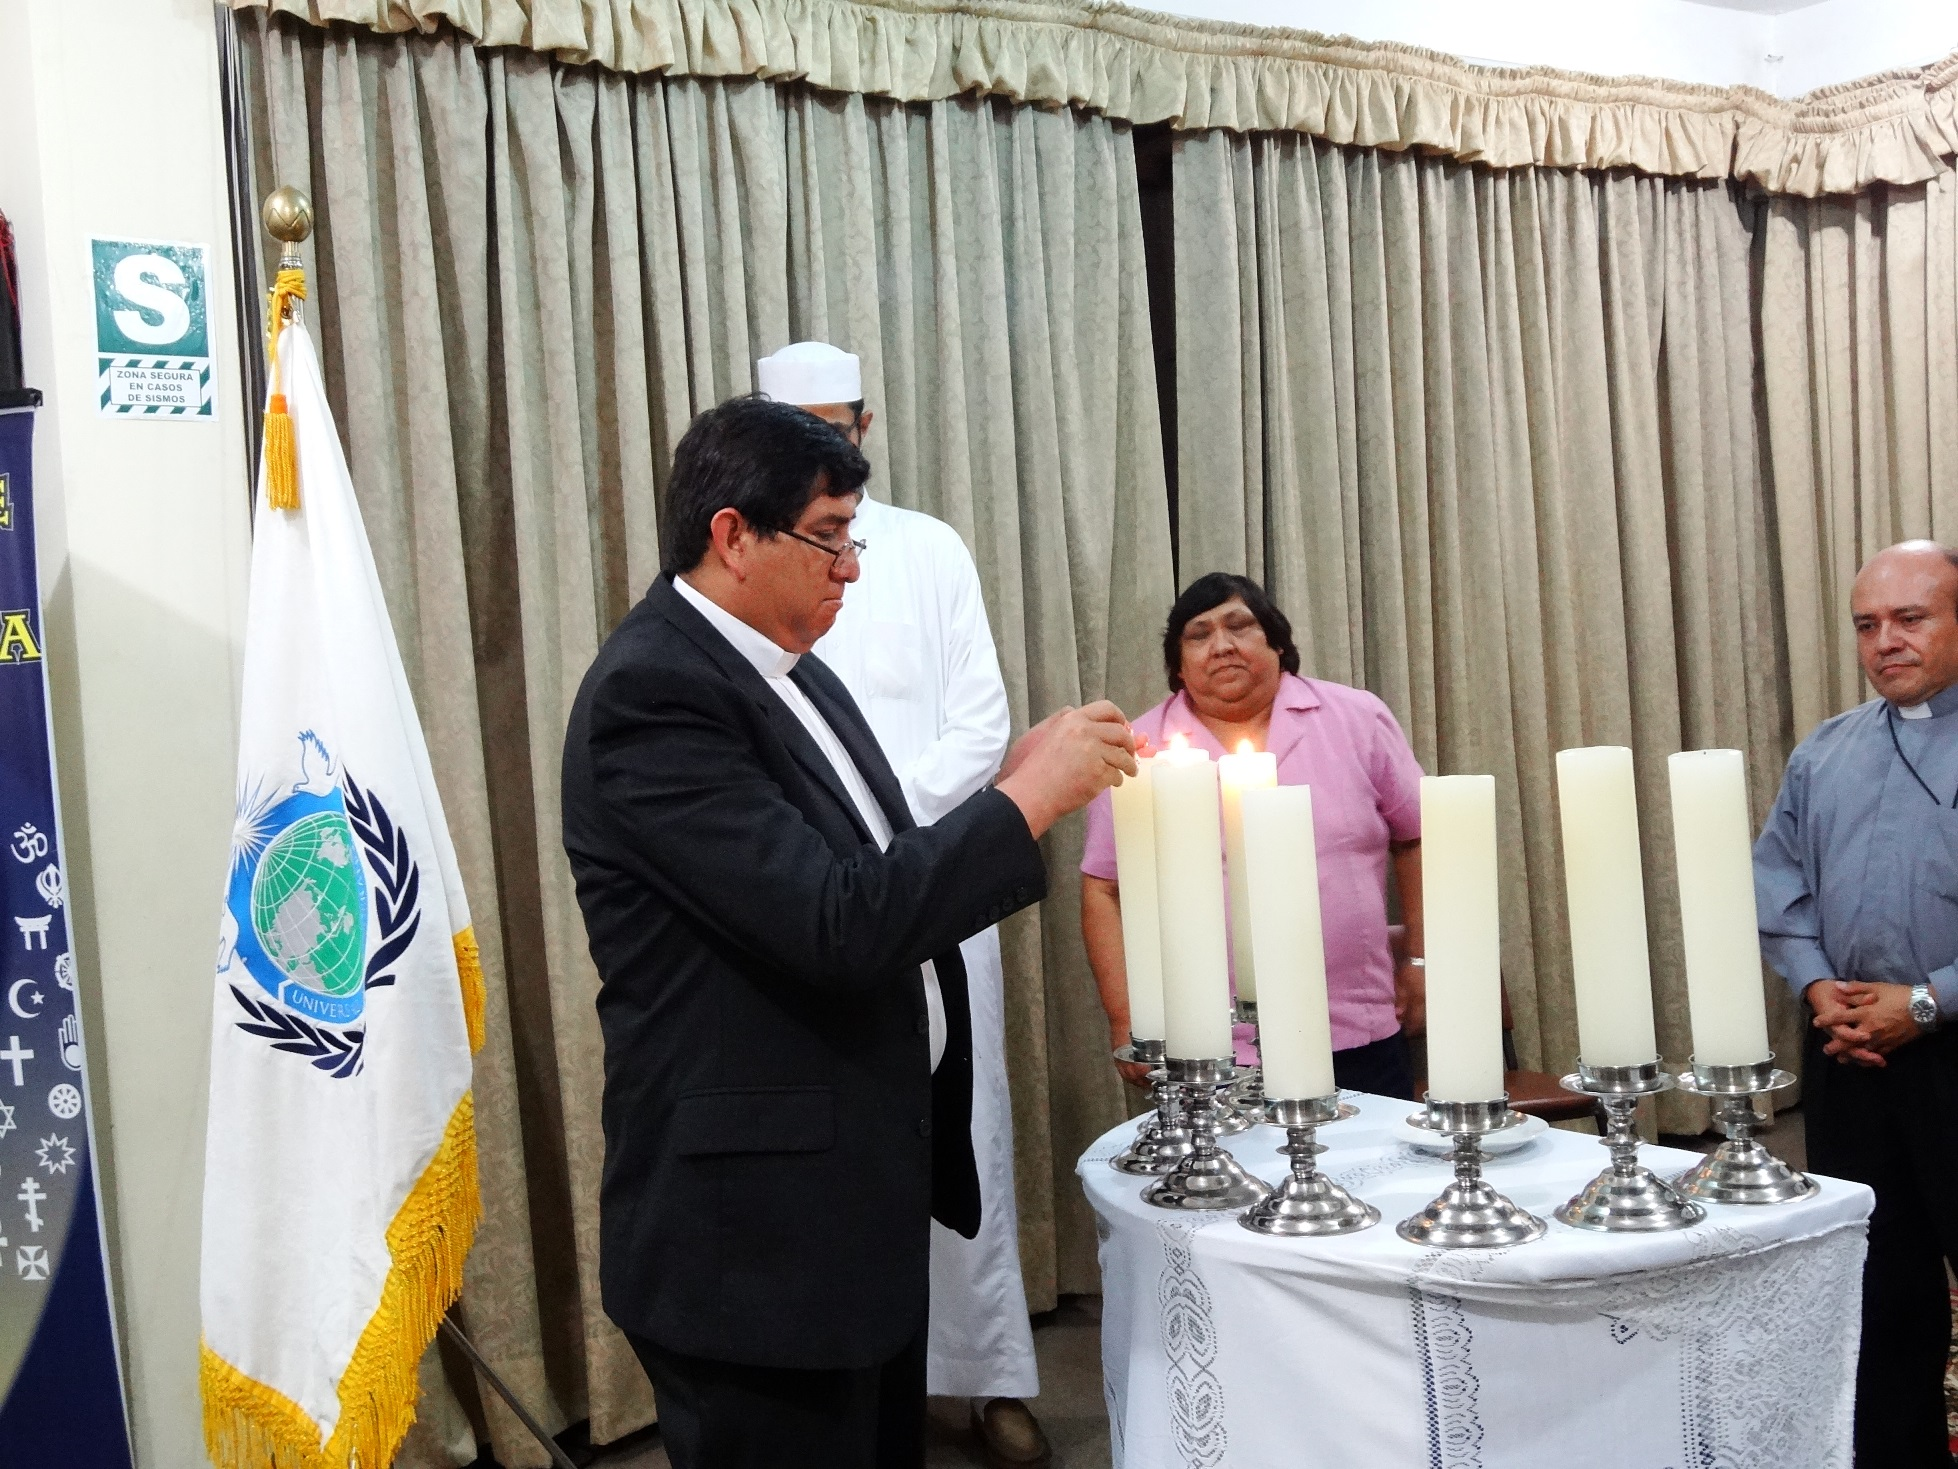 Candle ceremony 2.jpg